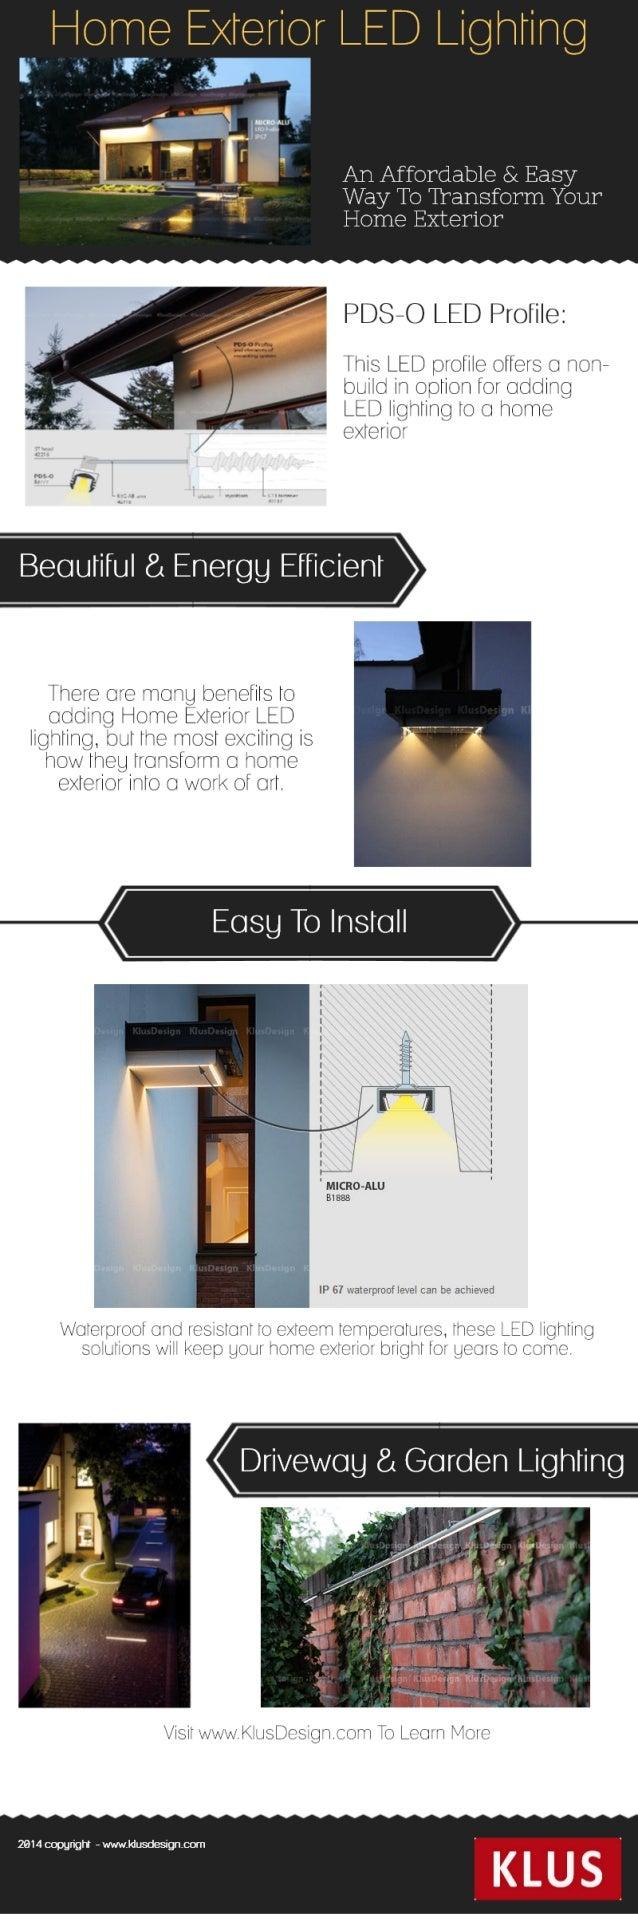 Home Exterior LED Lighting